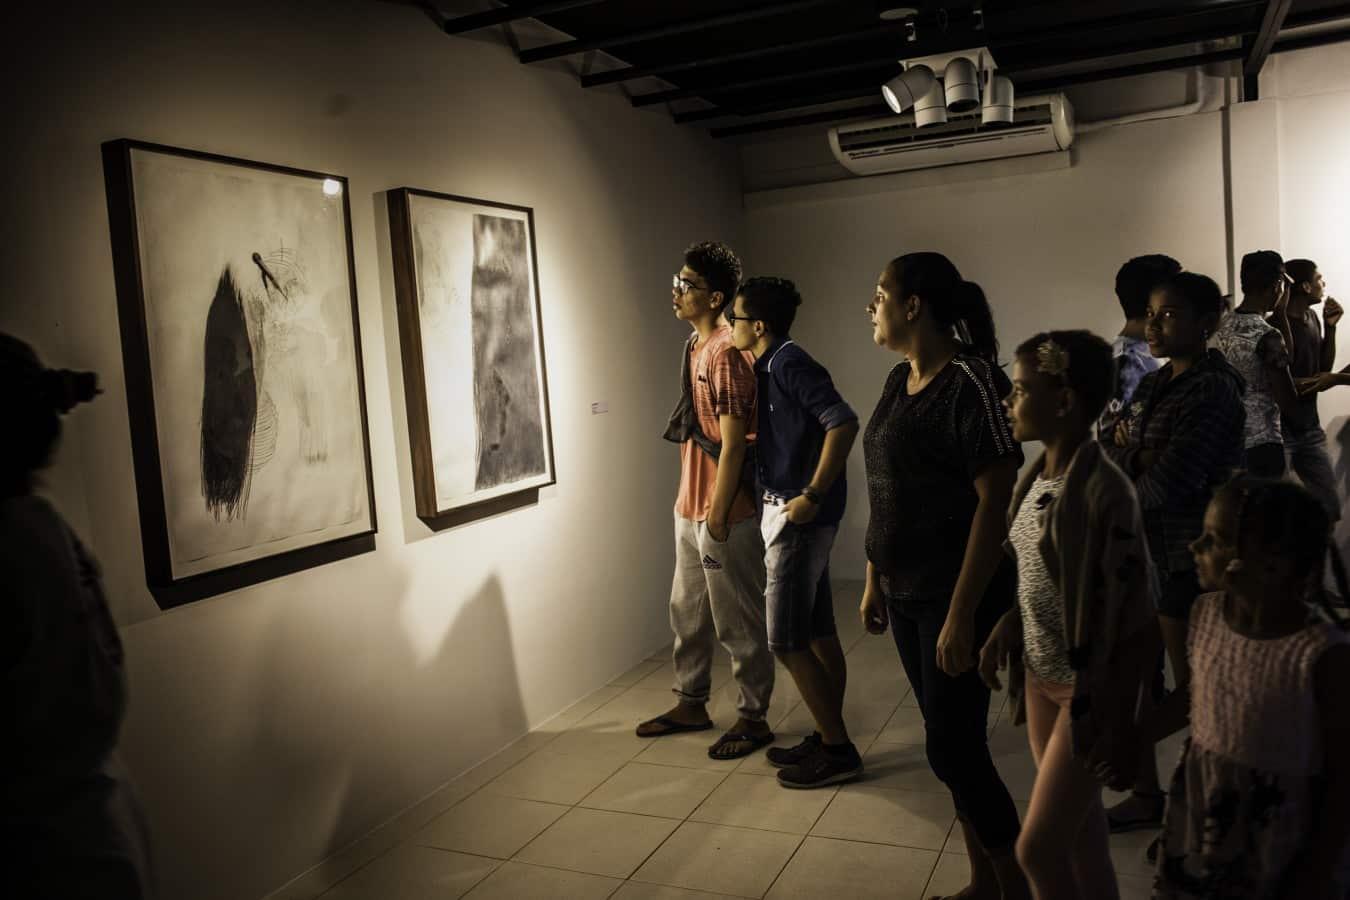 EXPOSIÇÃO - Carlos Mélo apresenta a Residência Belojardim